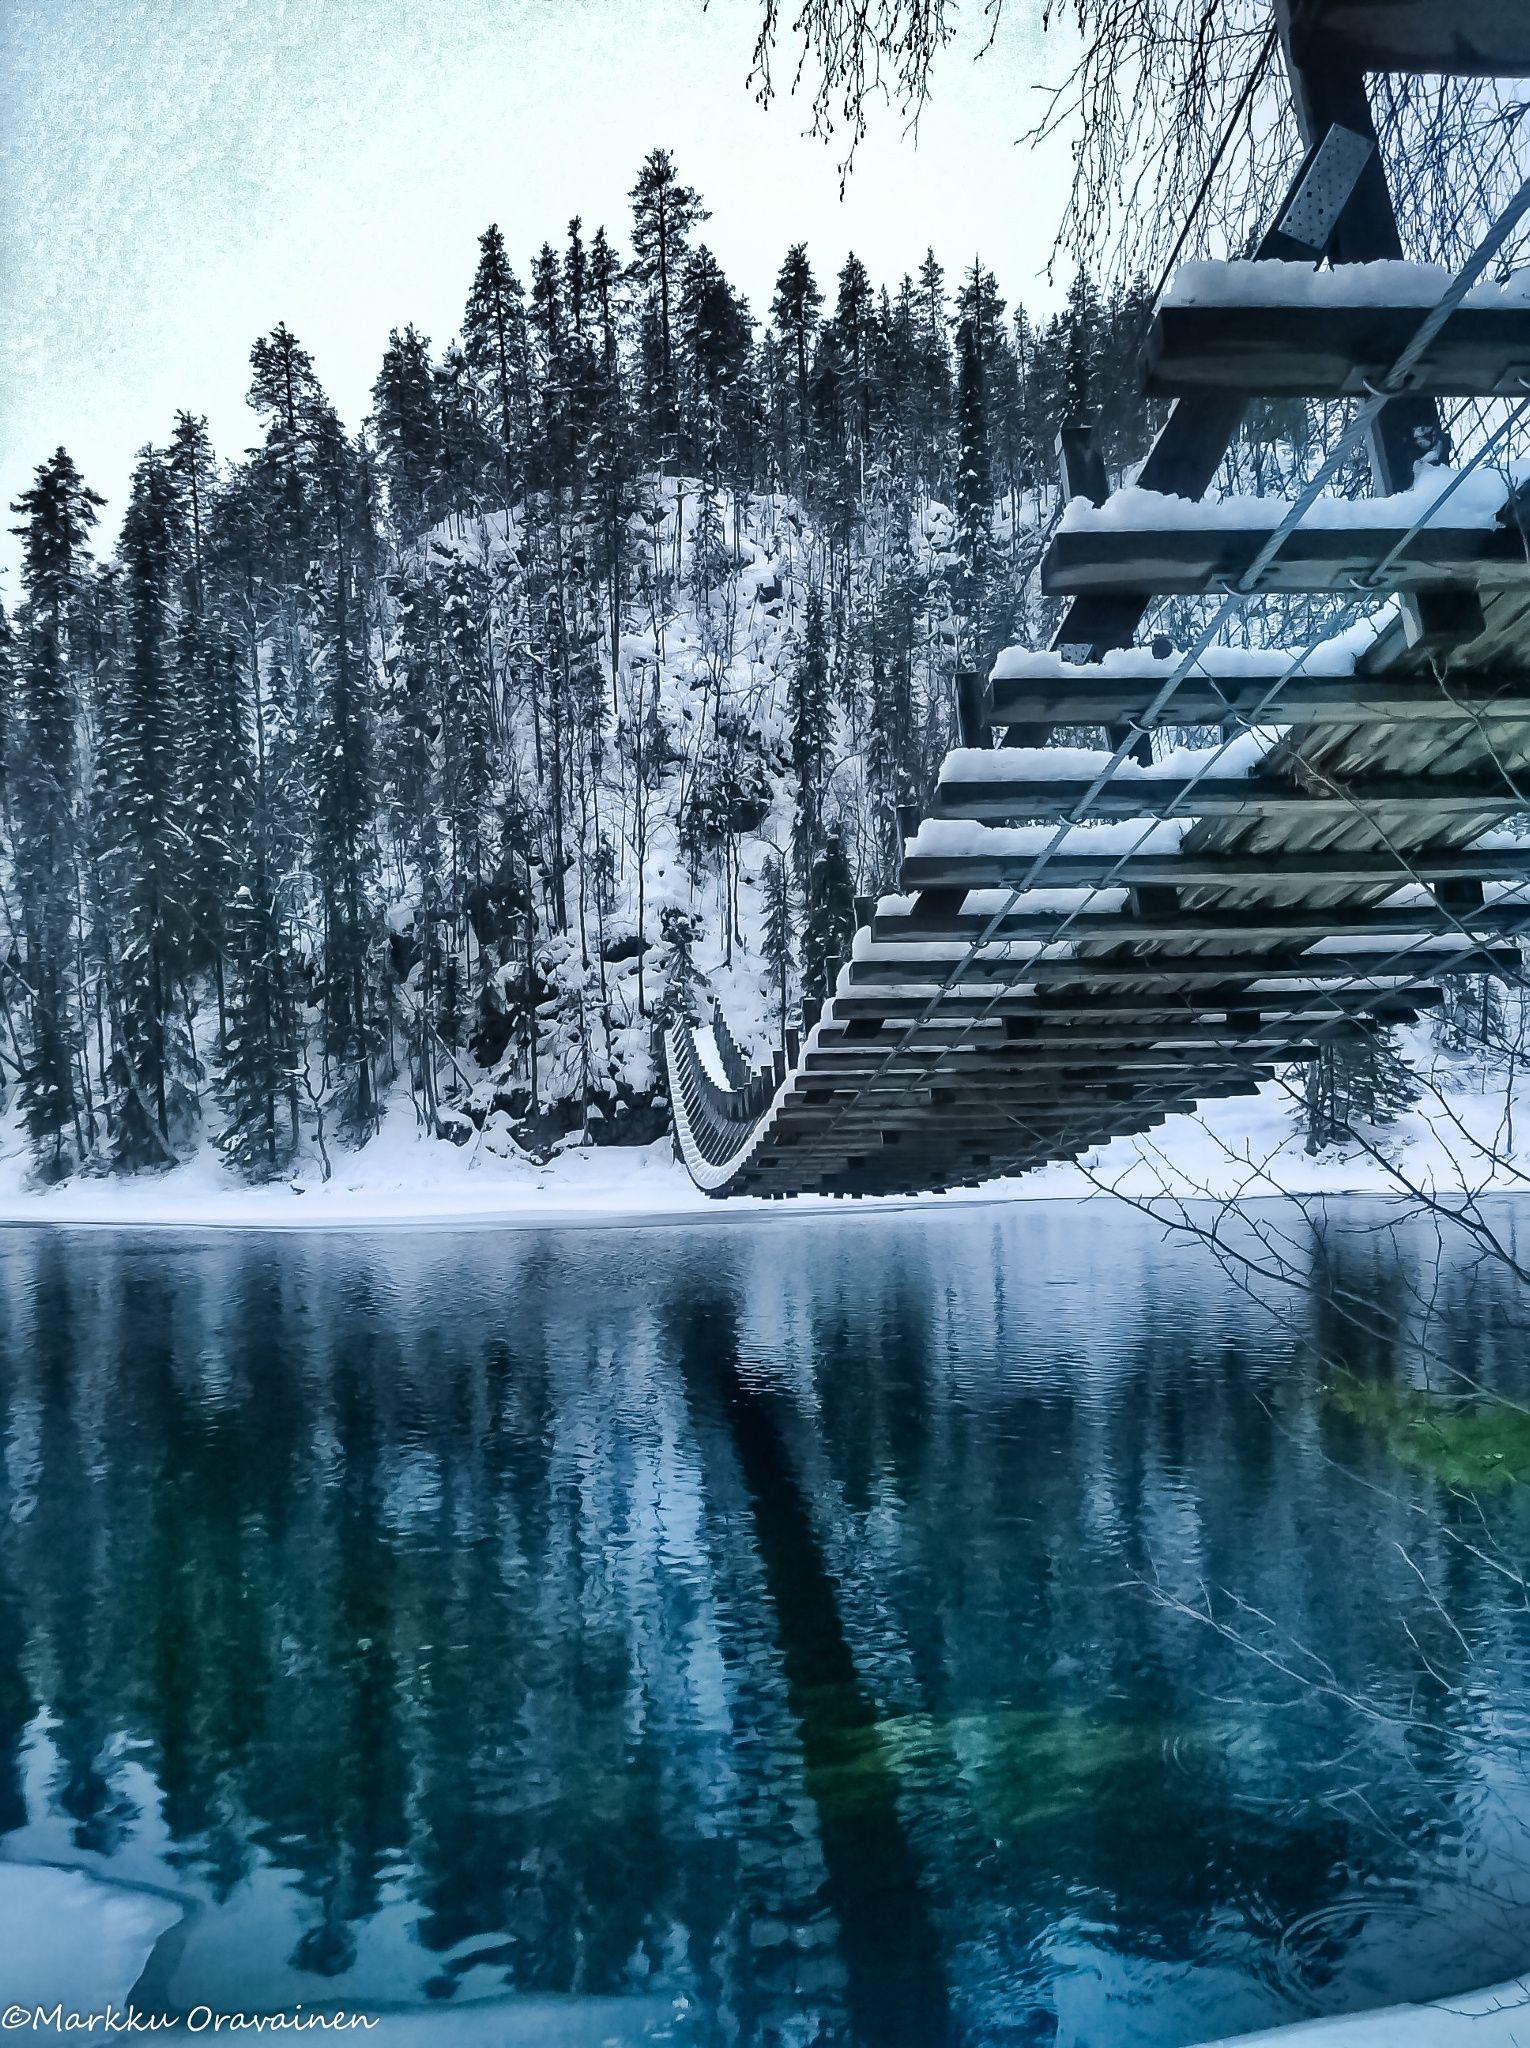 Places That Are Even Better During The Winter winter suspension bridge, kuusamo's harrisuvanto, finland | travel destinations in europe   architecture #adventure